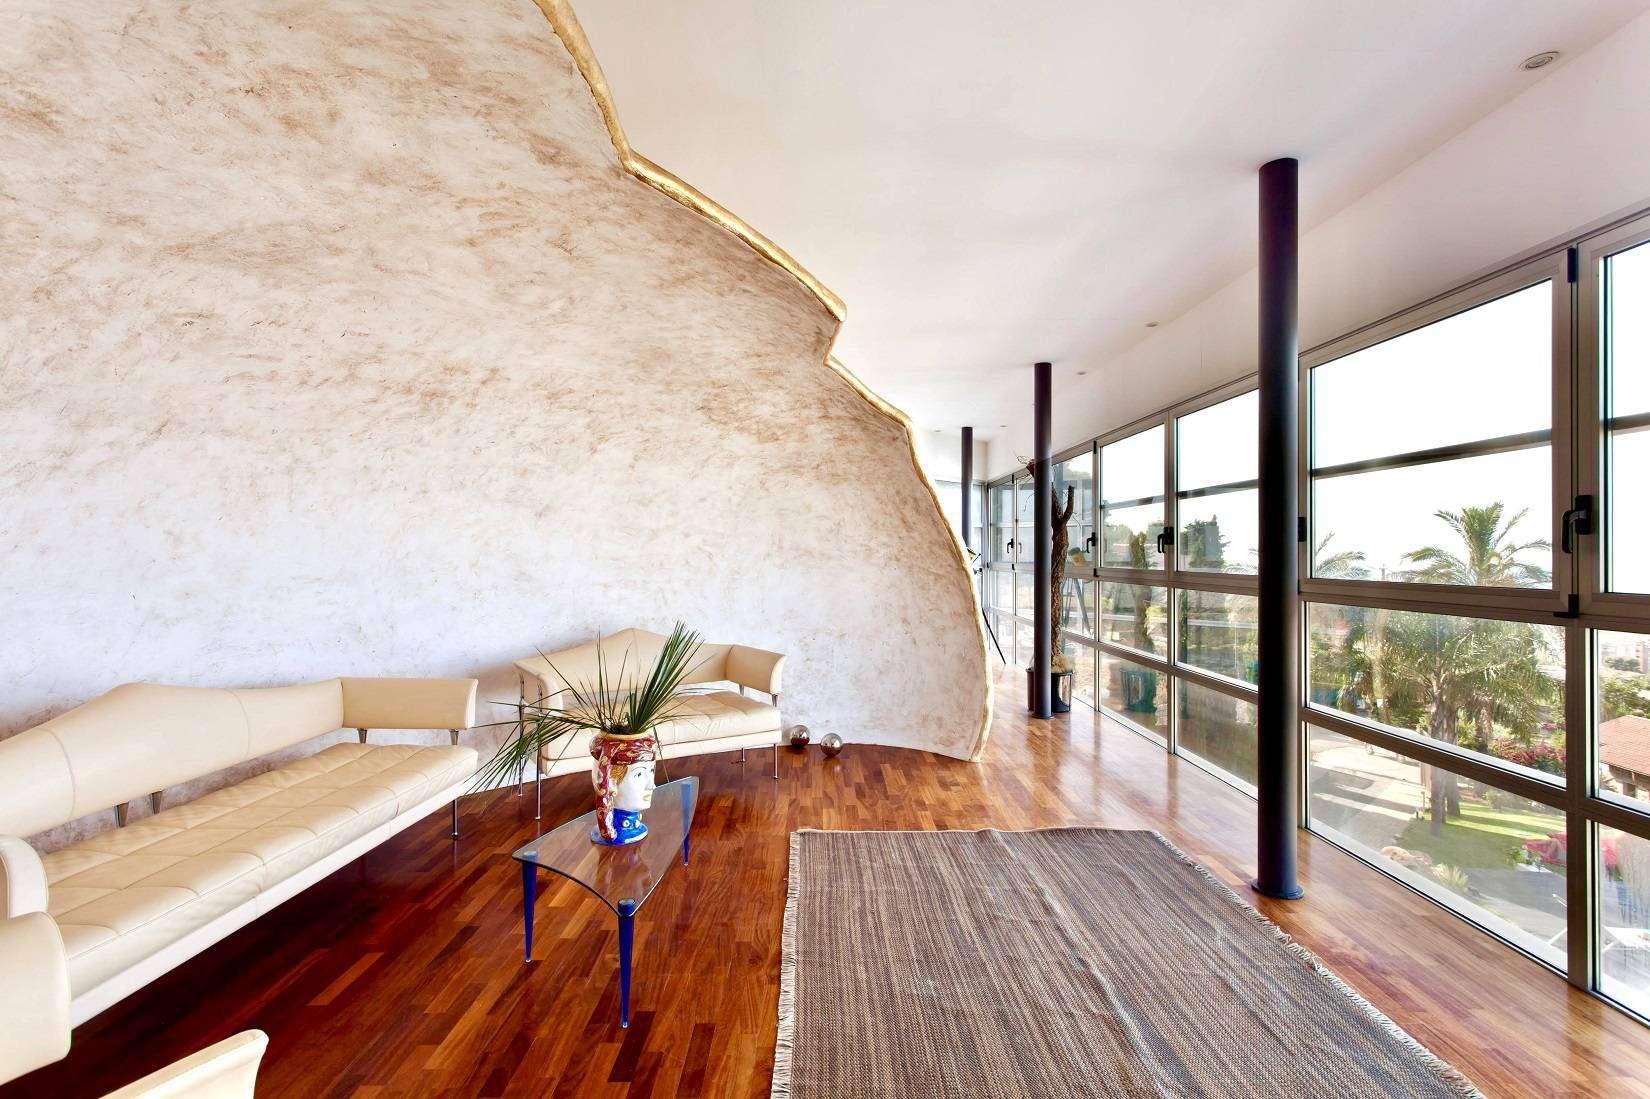 6 Infinity Living room